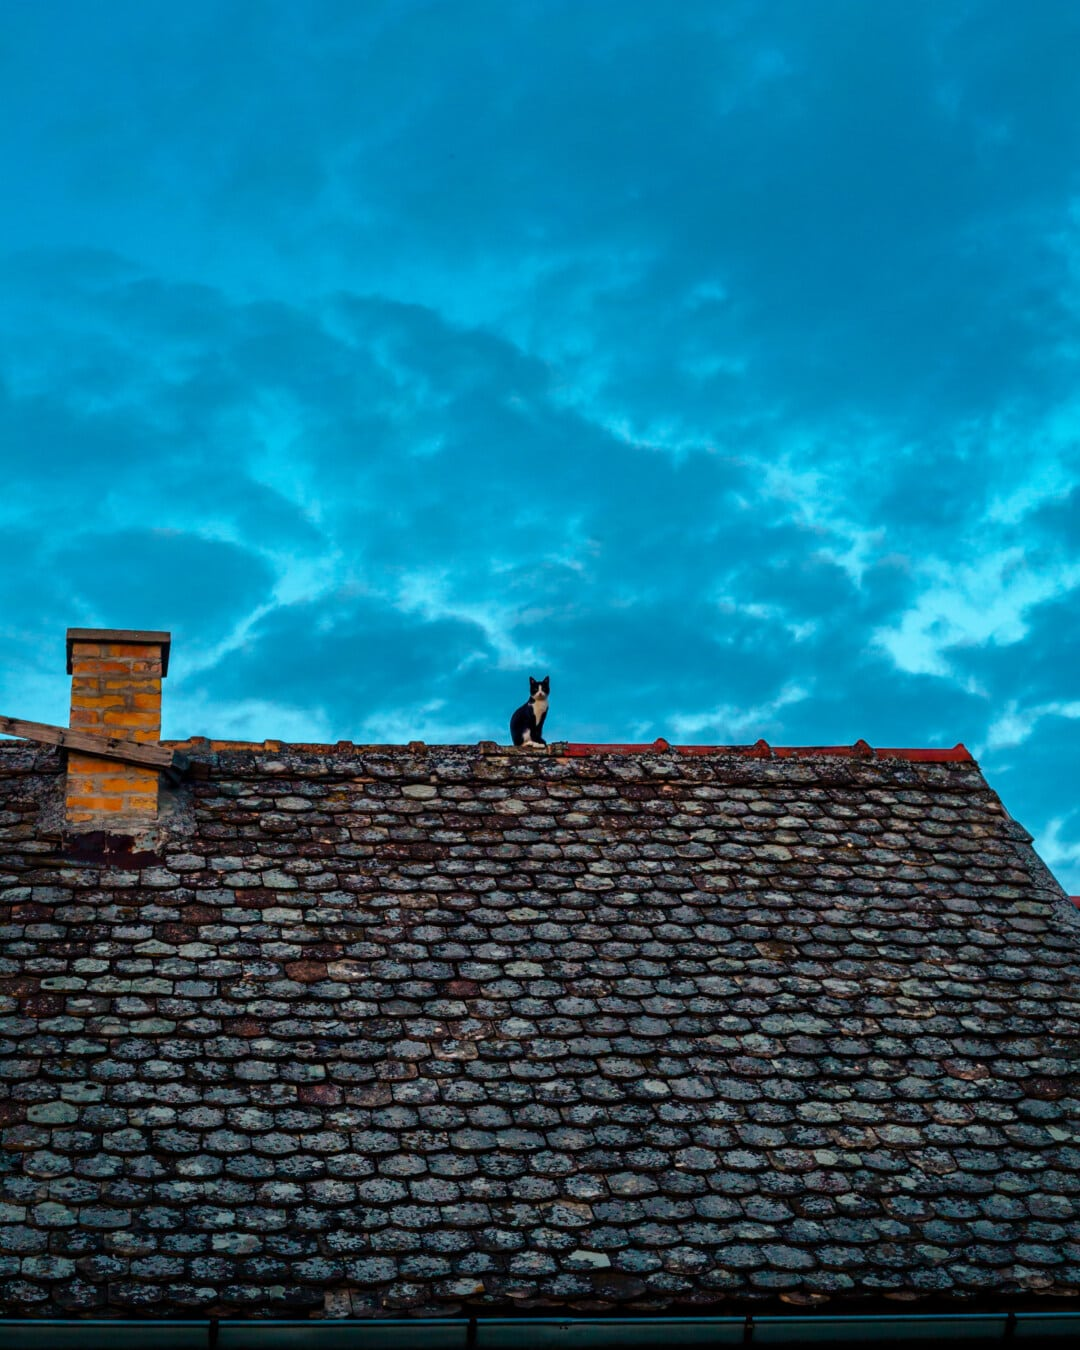 svart-hvitt, katten, taket, sitter, gamle, huset, materiale, taktekking, arkitektur, taket